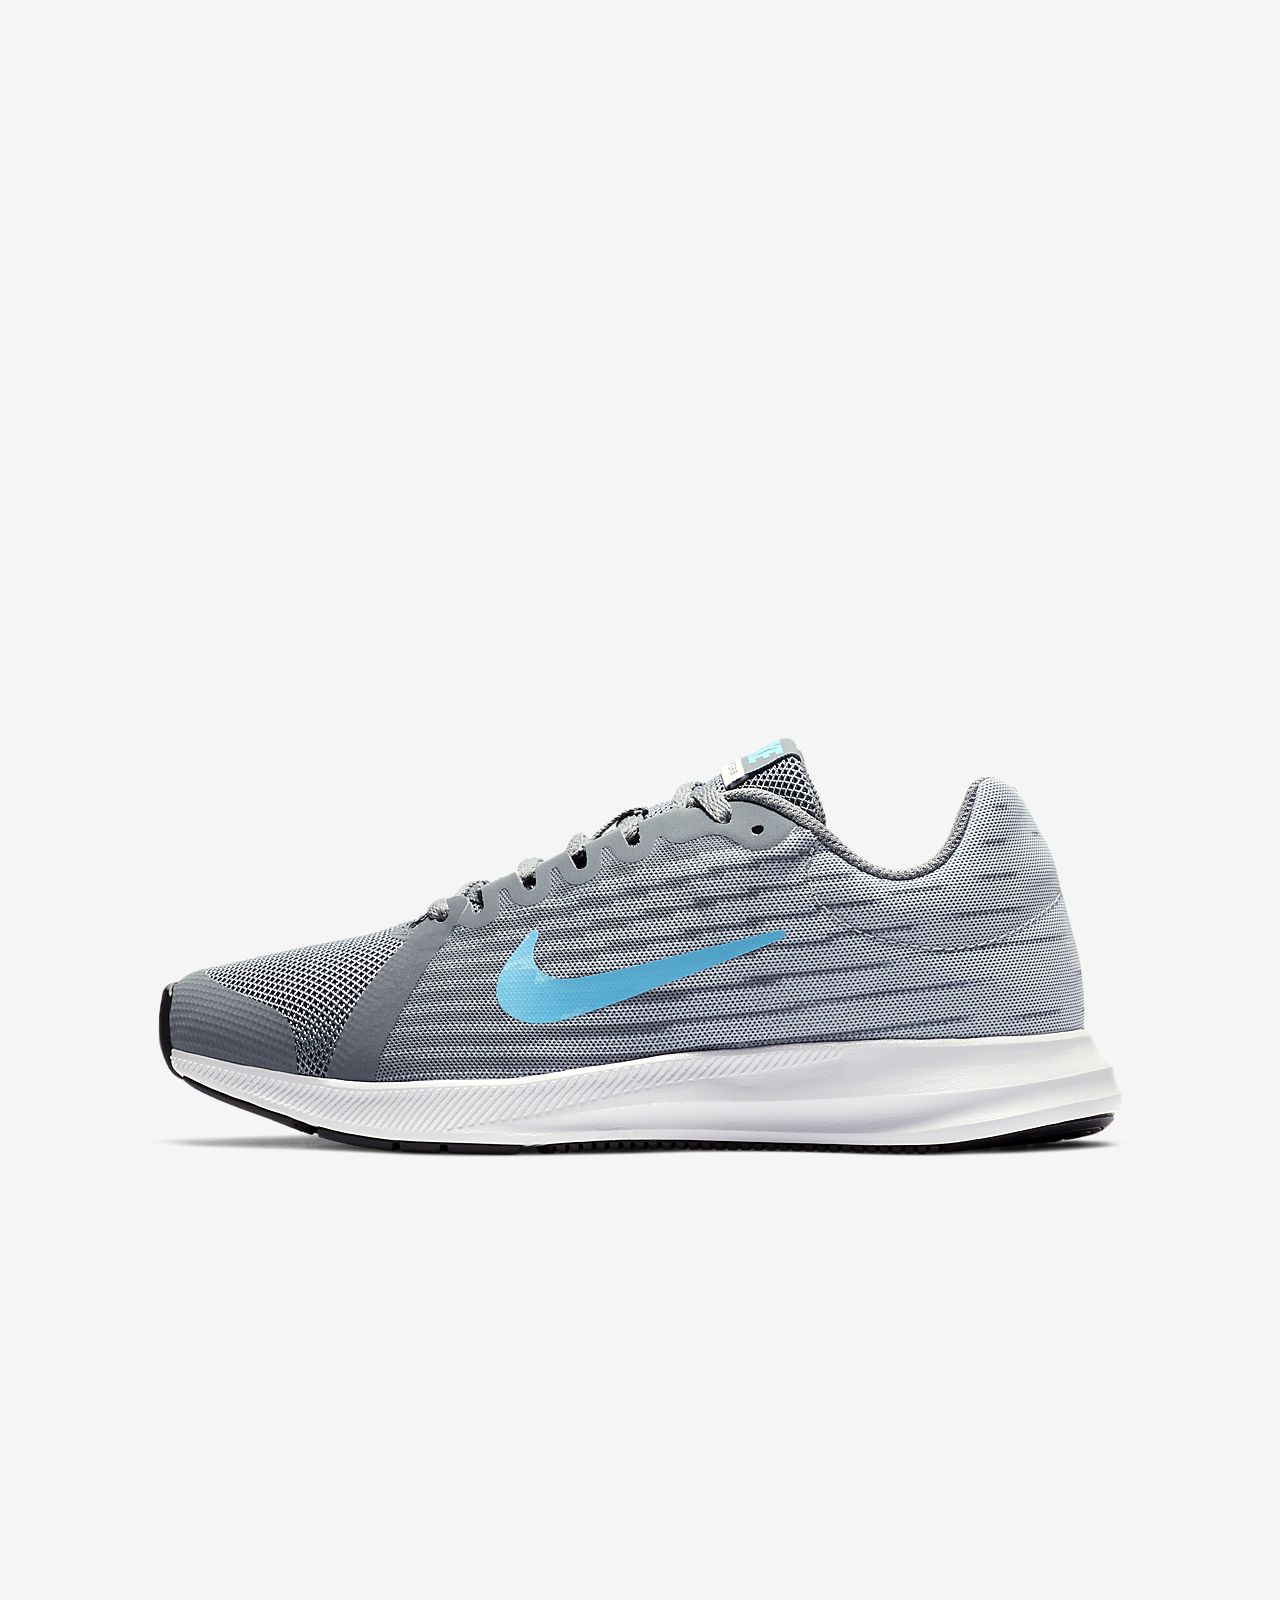 5777401f780 Παπούτσι για τρέξιμο Nike Downshifter 8 για μεγάλα αγόρια. Nike.com GR